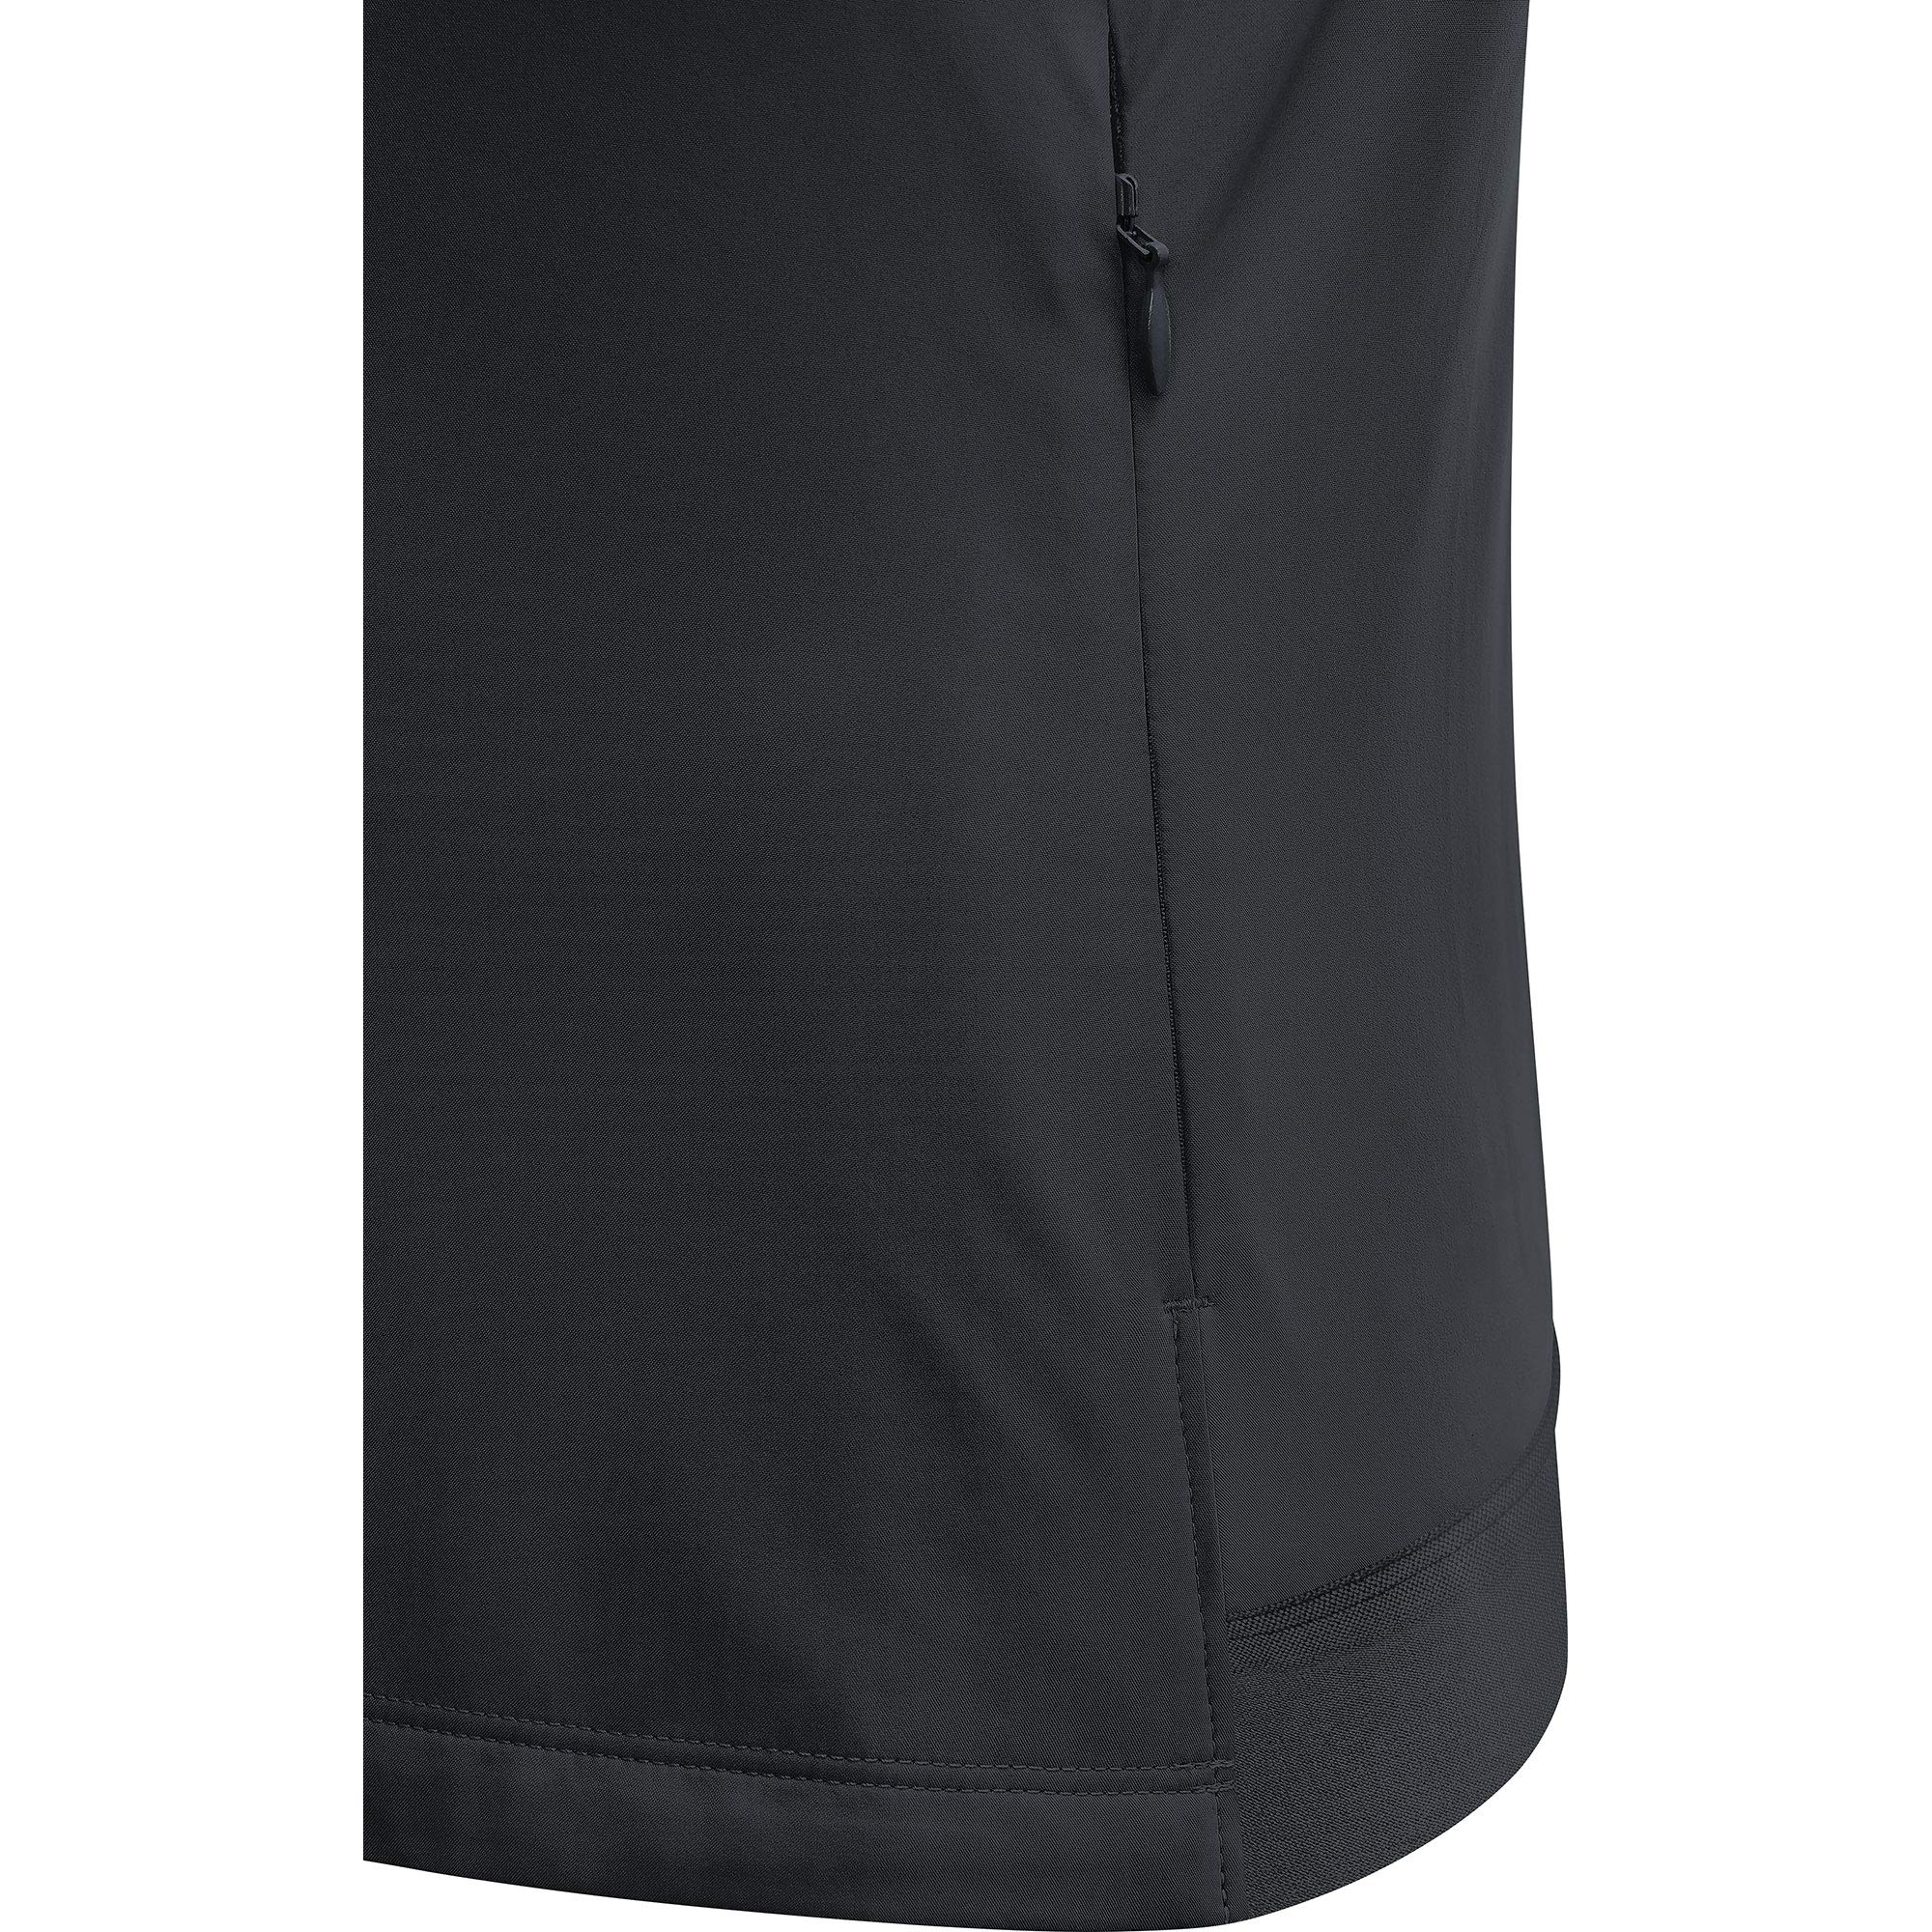 Gore Women's R3 Wmn Gws Vest,  black,  XL by GORE WEAR (Image #6)